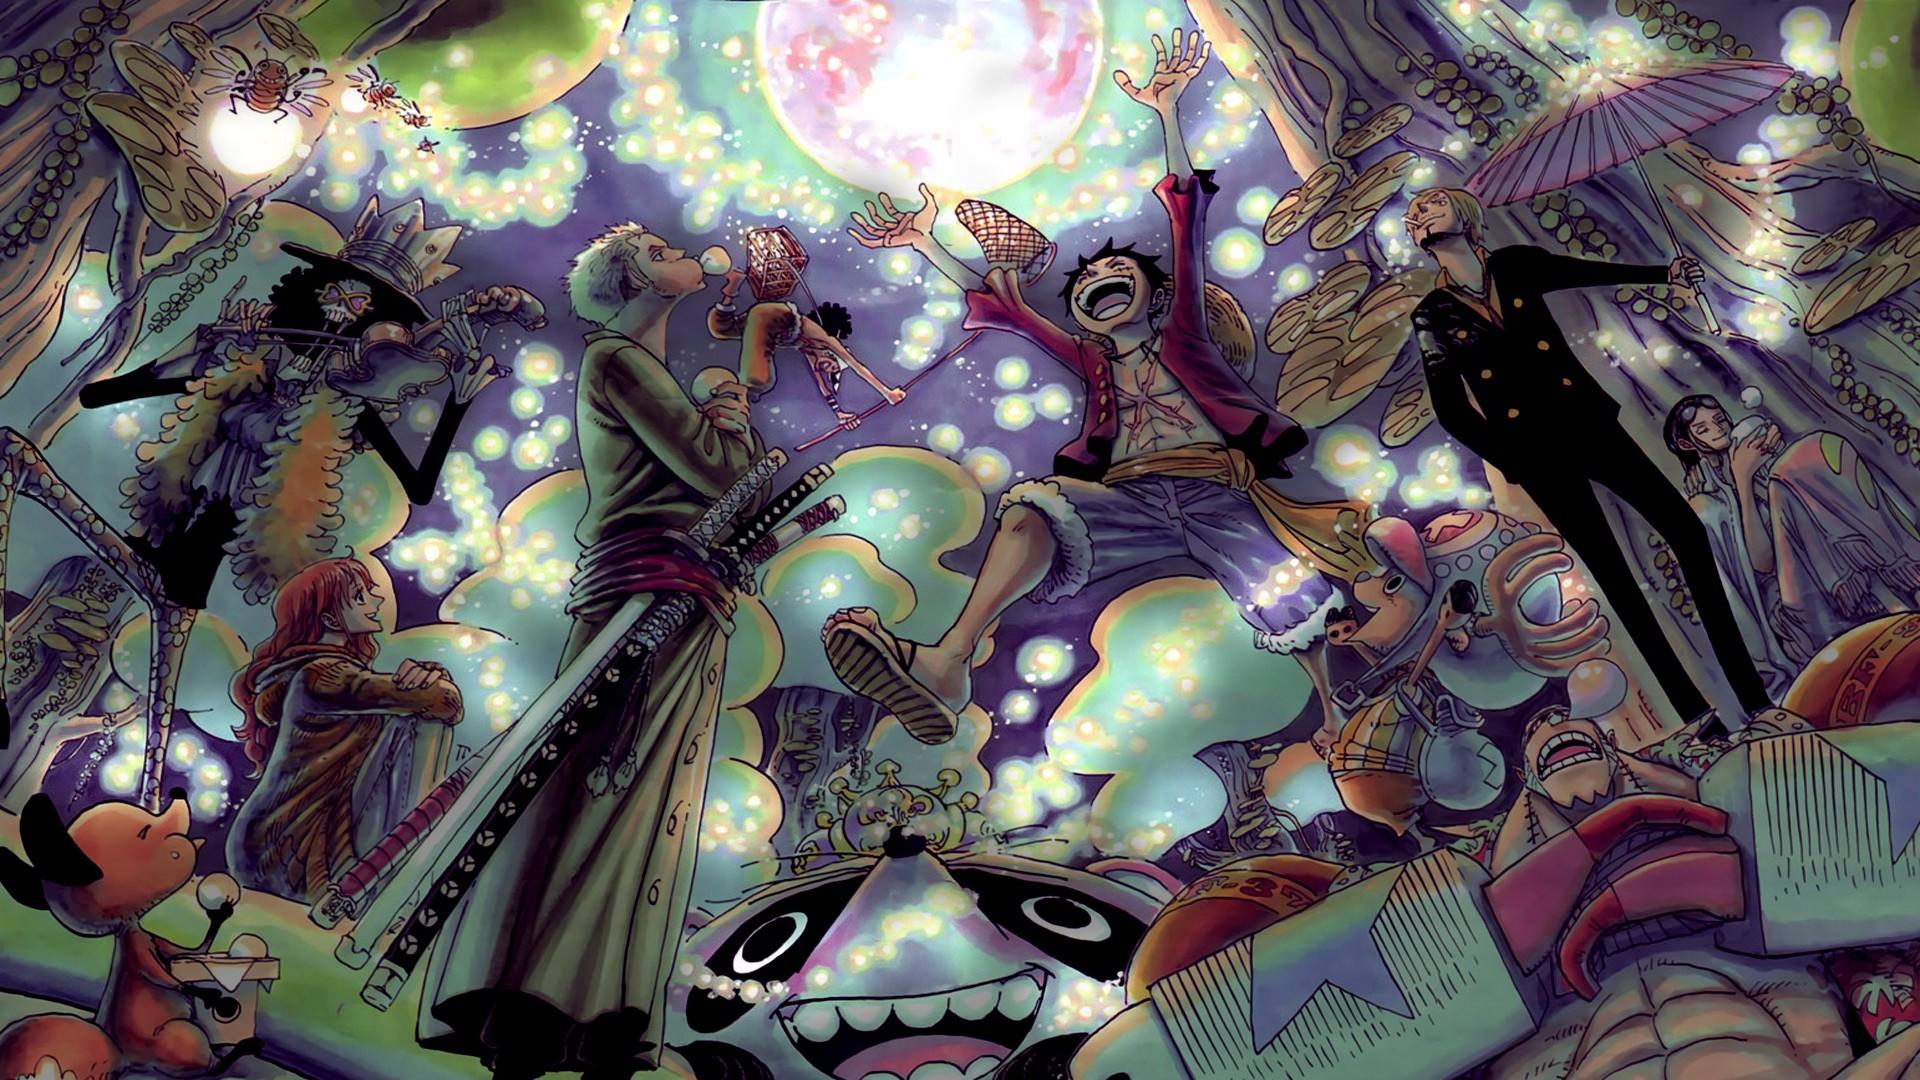 100 Wallpapers de anime HD 116277